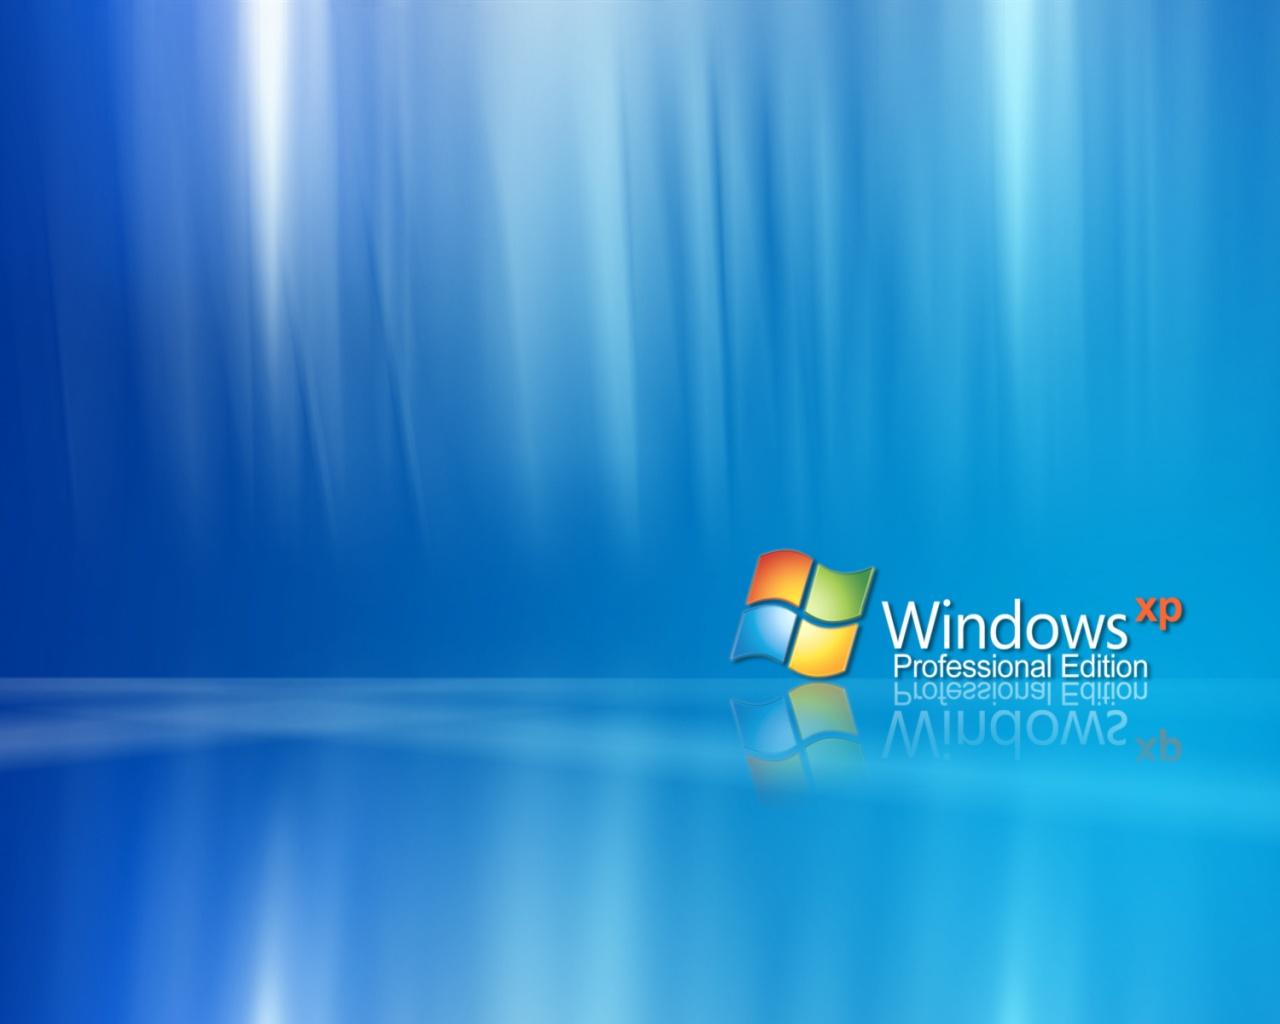 1280x1024 Windows XP Pro desktop PC and Mac wallpaper 1280x1024